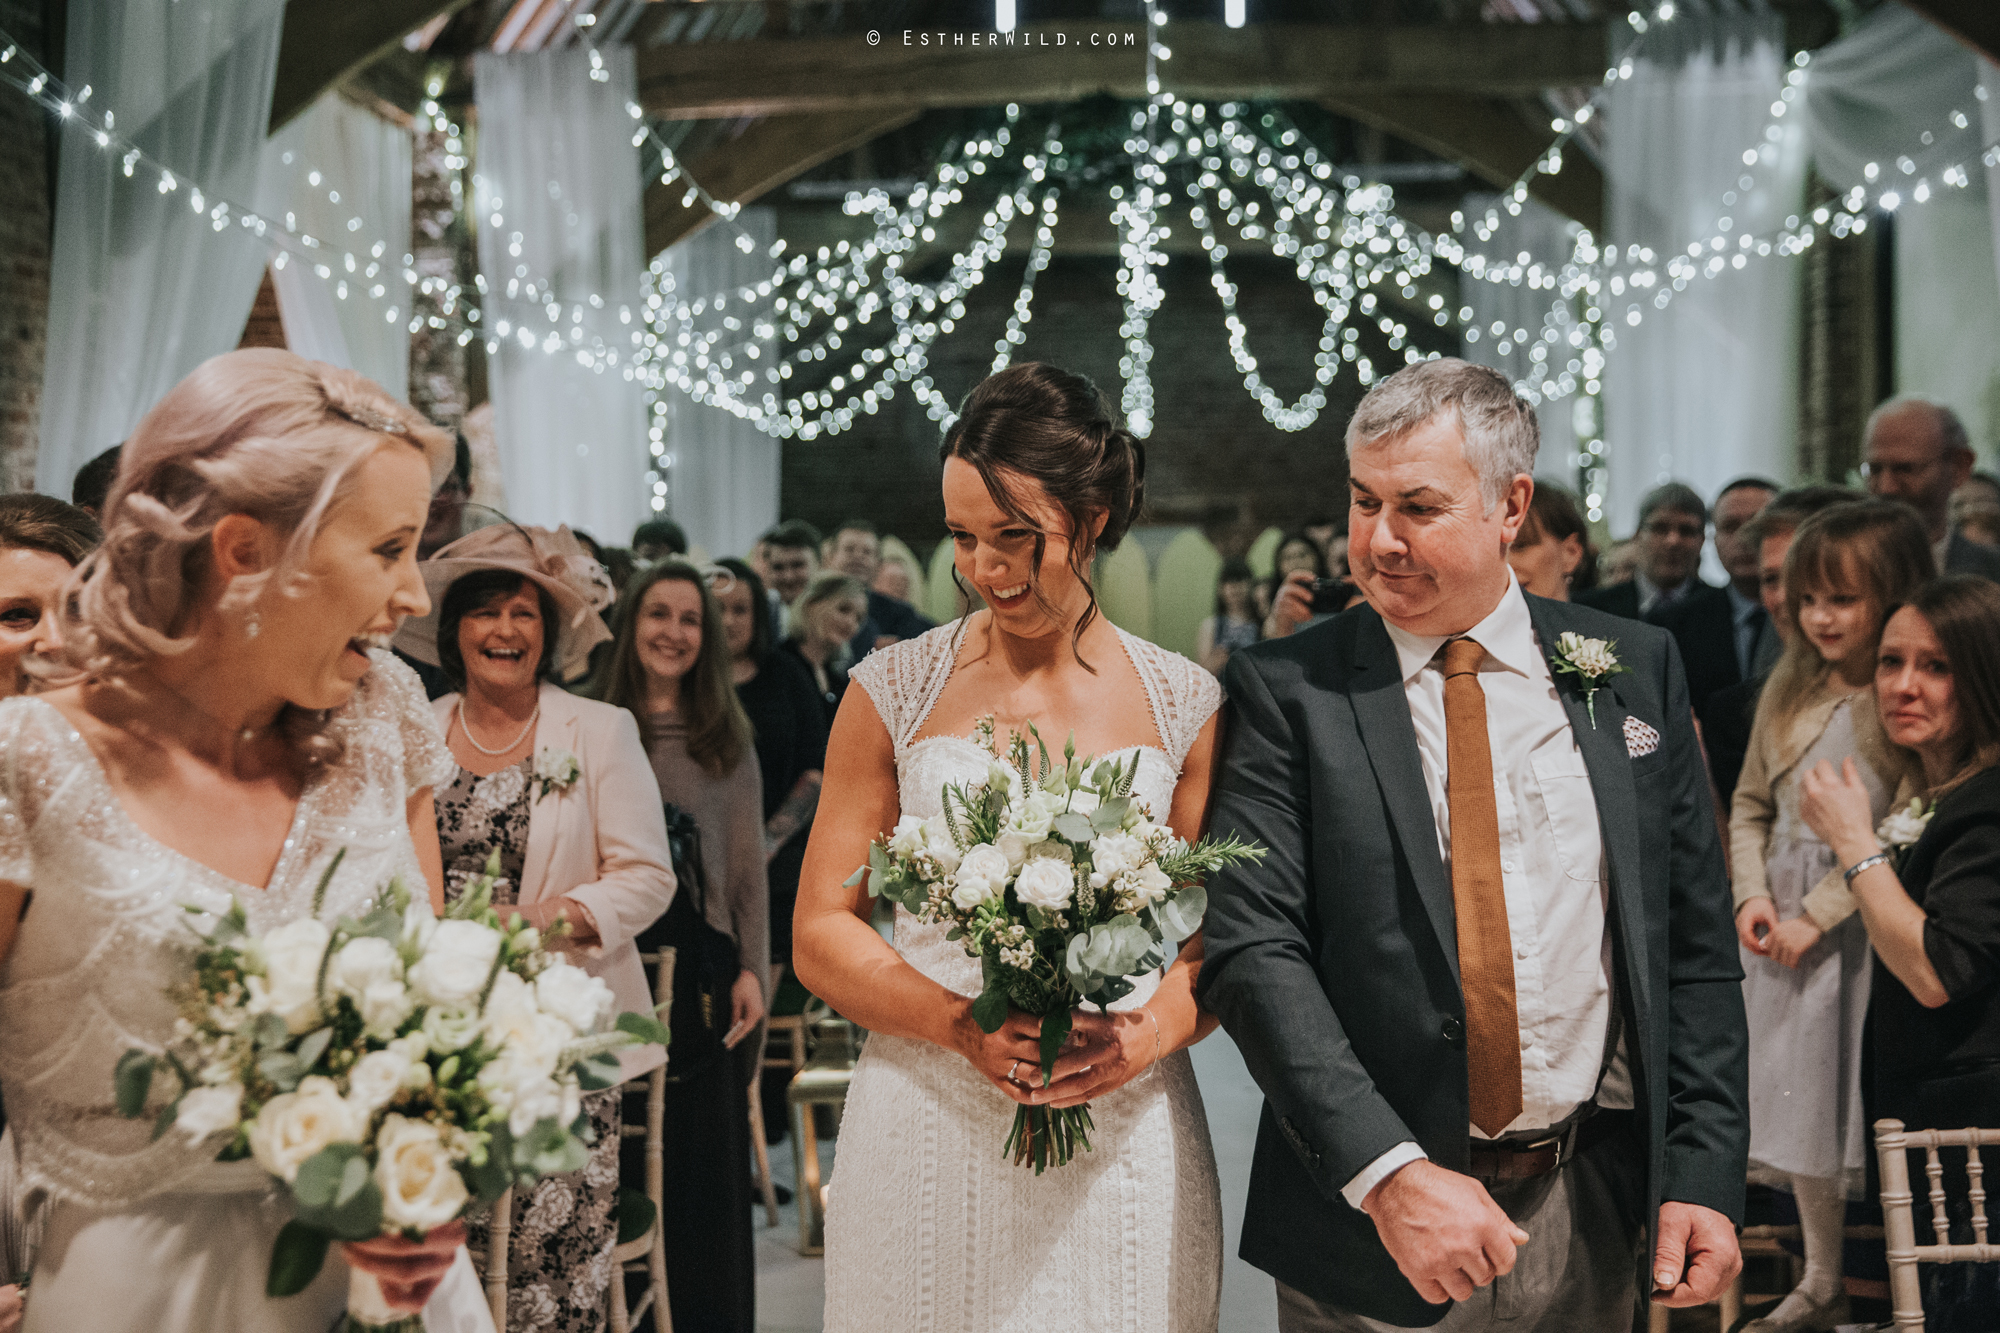 Elms_Barn_Weddings_Suffolk_Photographer_Copyright_Esther_Wild_IMG_1138.jpg